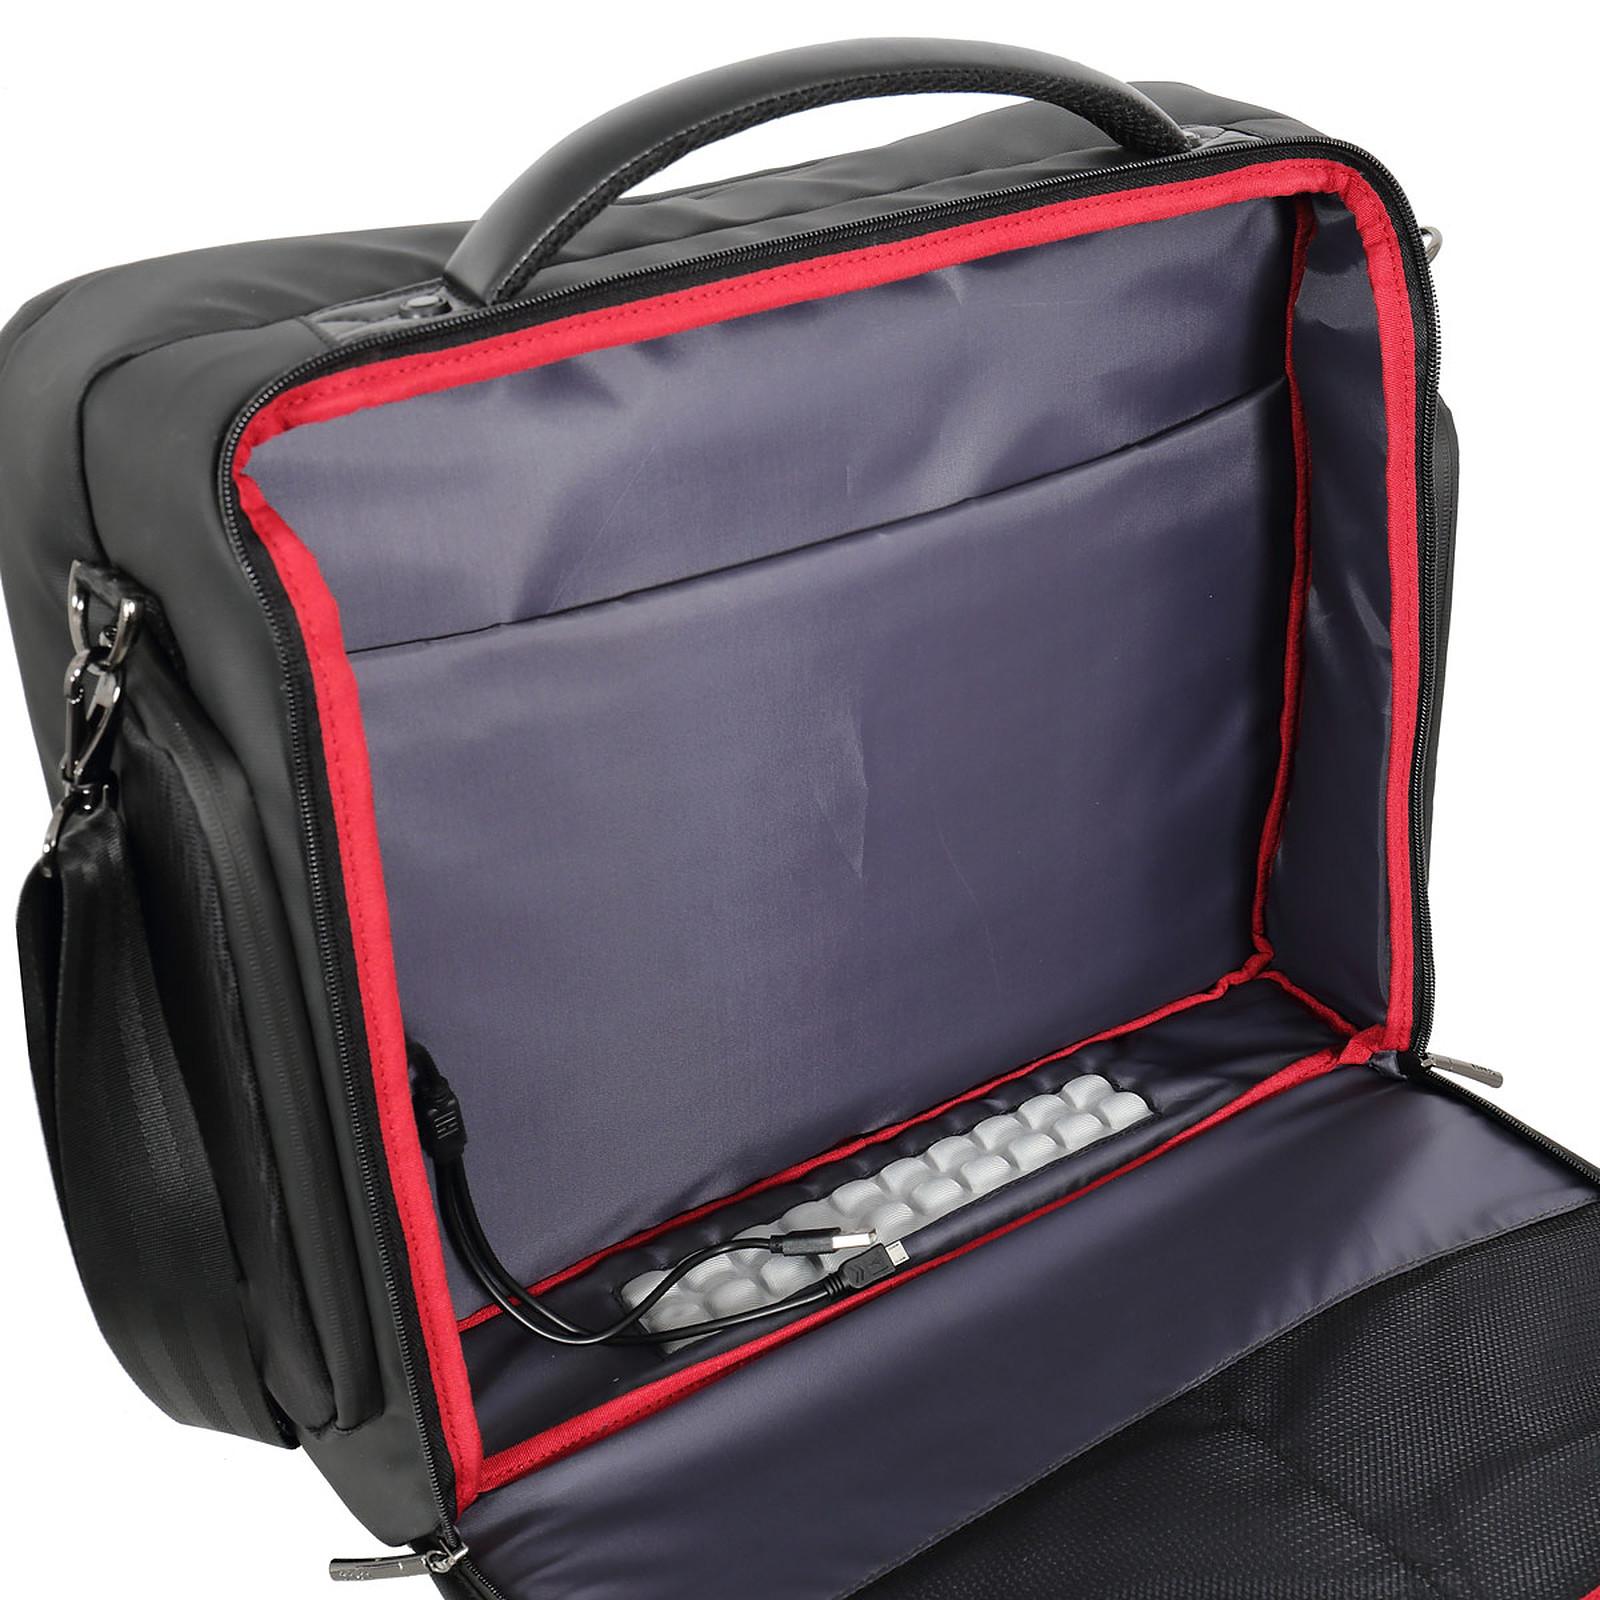 b8f65edba8 LDLC Traveller 15.6